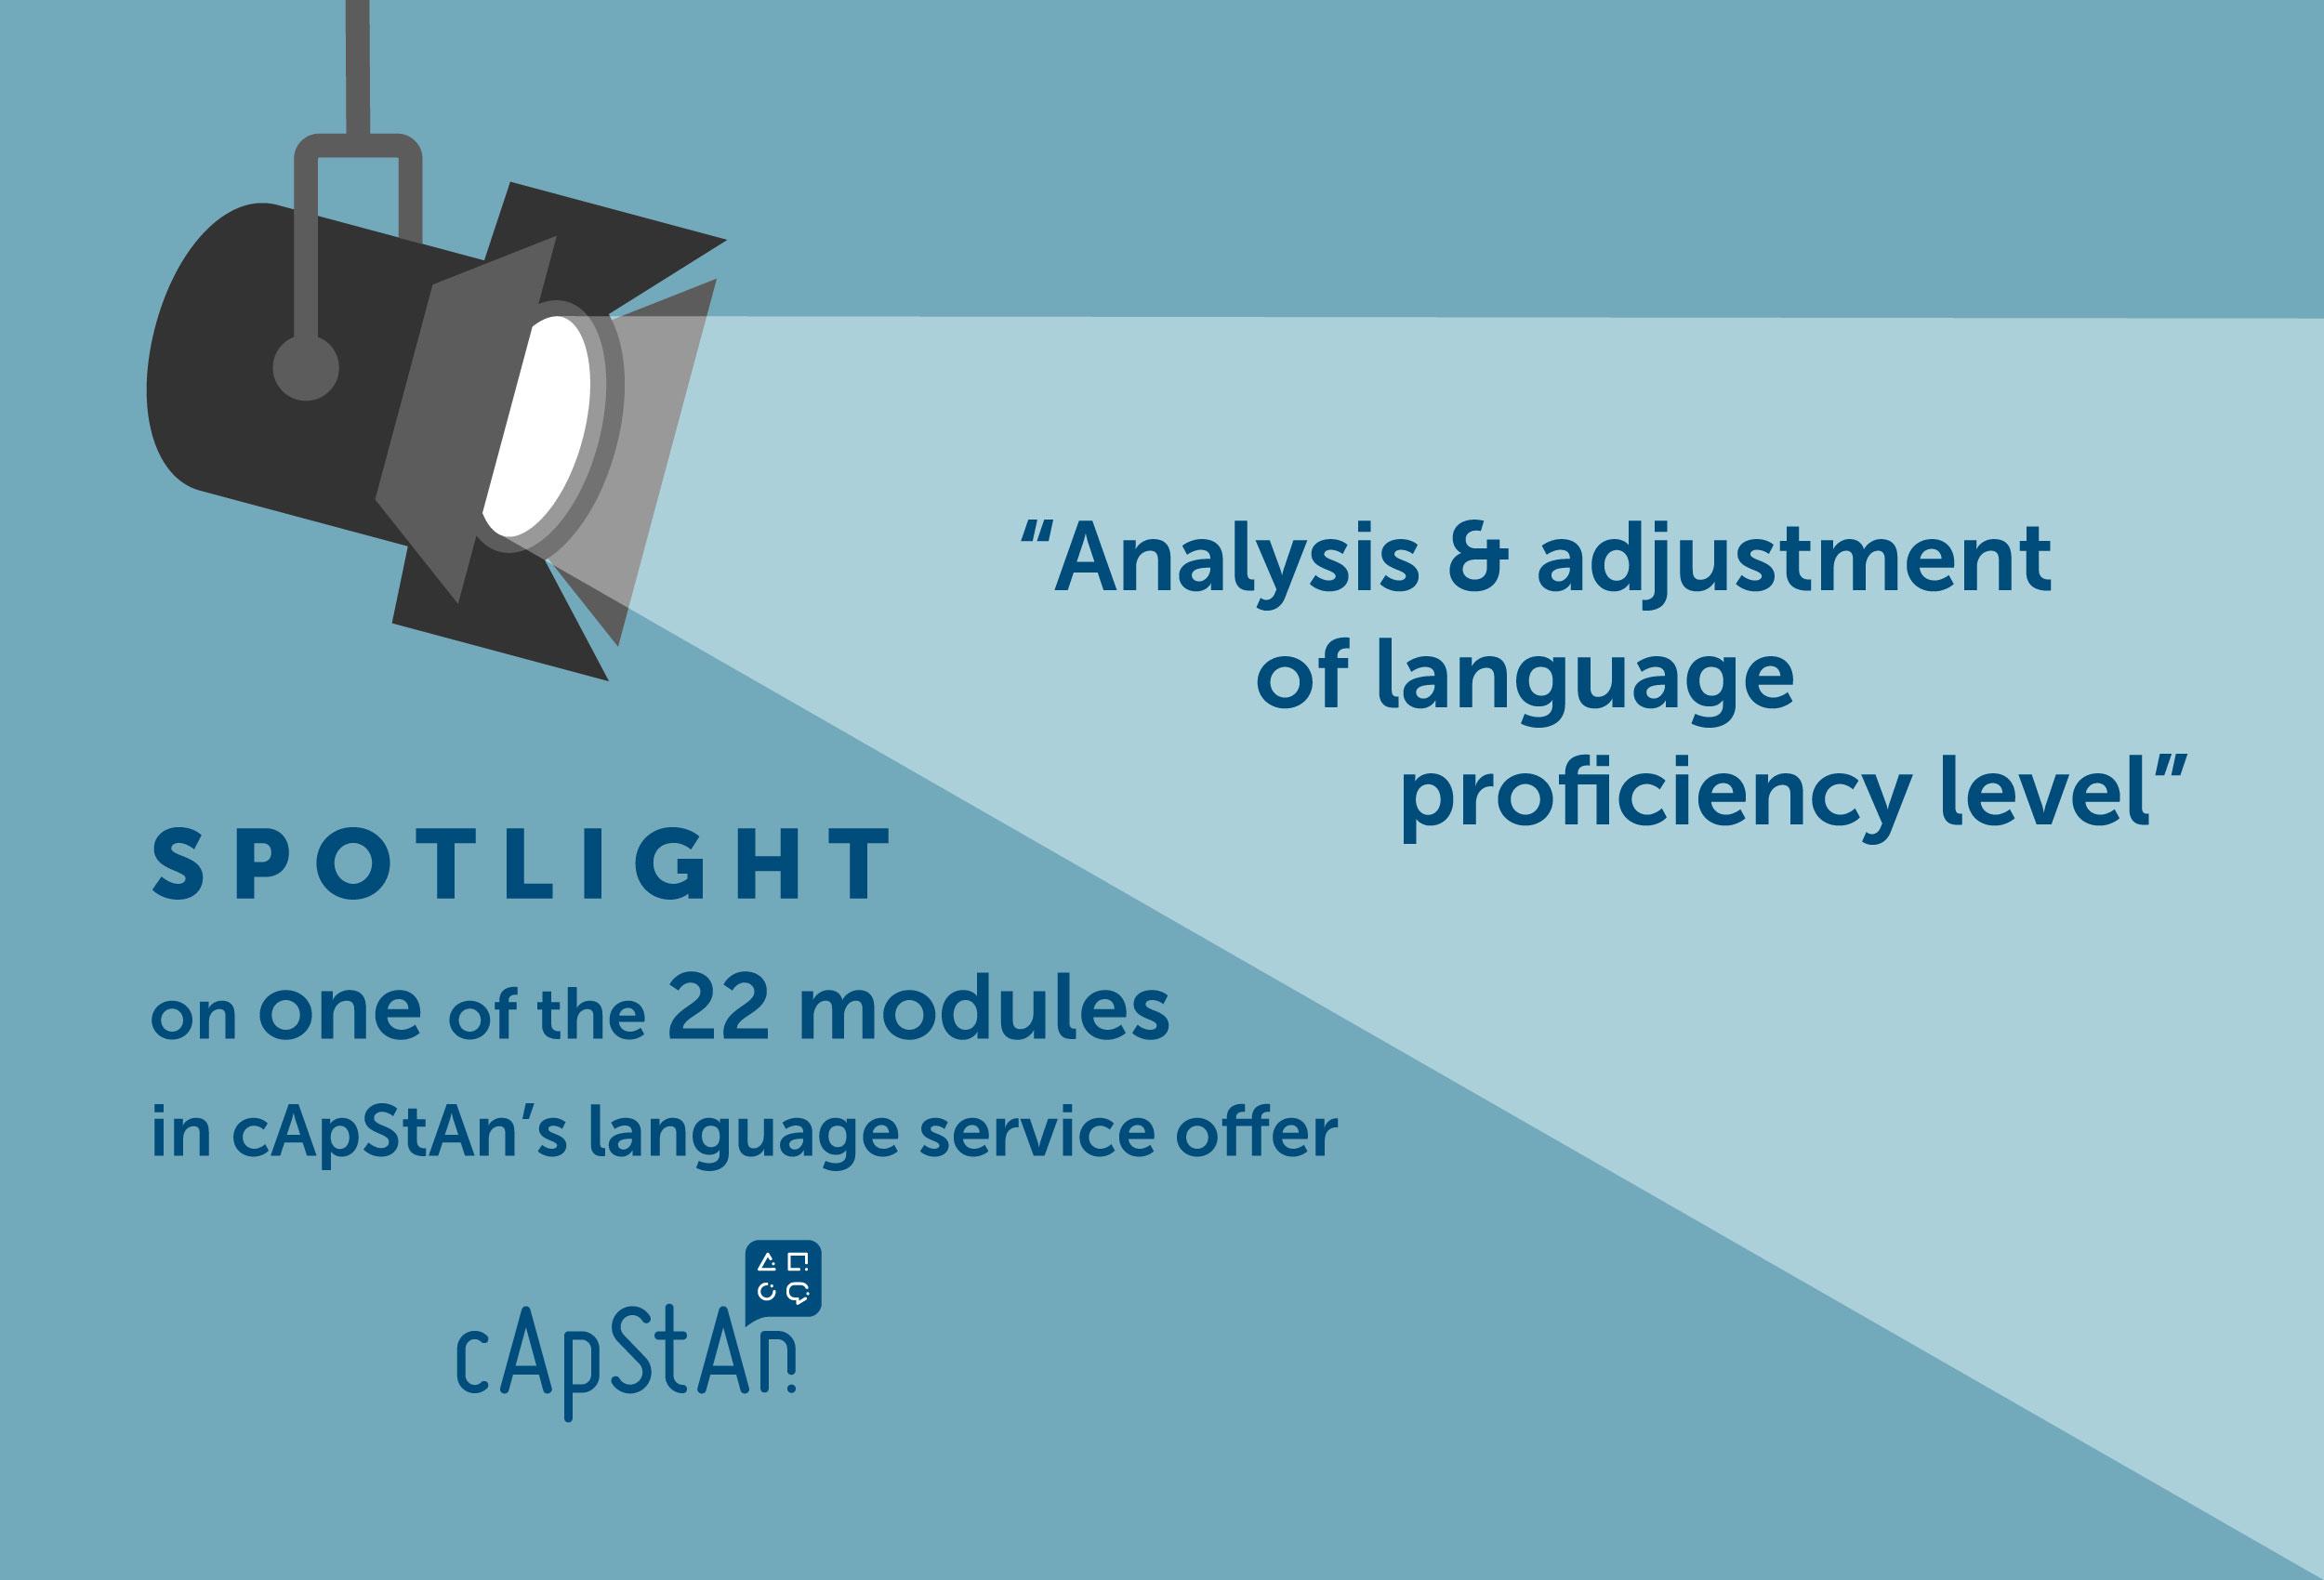 Consultancy Services - Analysis & Adjustment of Language Proficiency Level